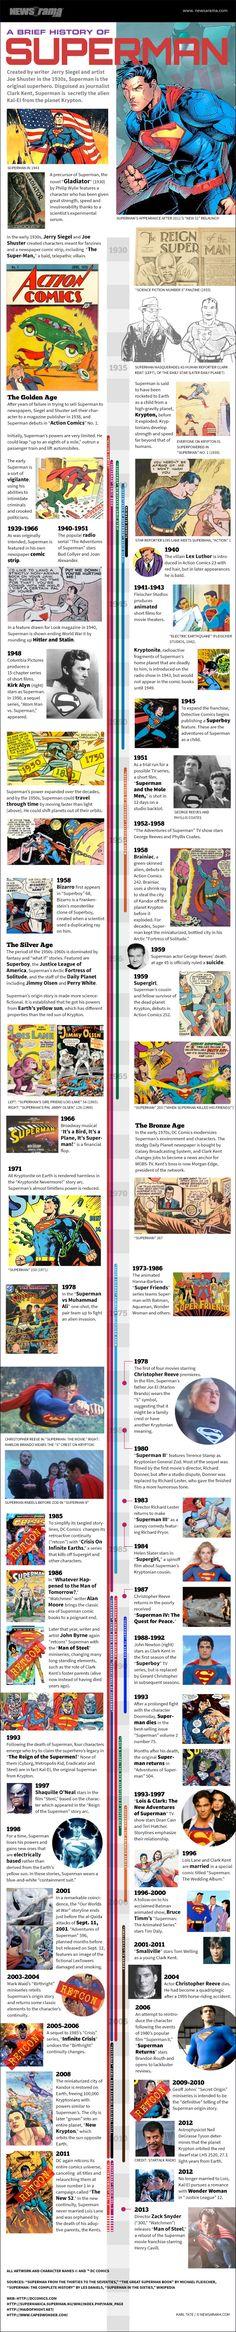 Superman history infographic